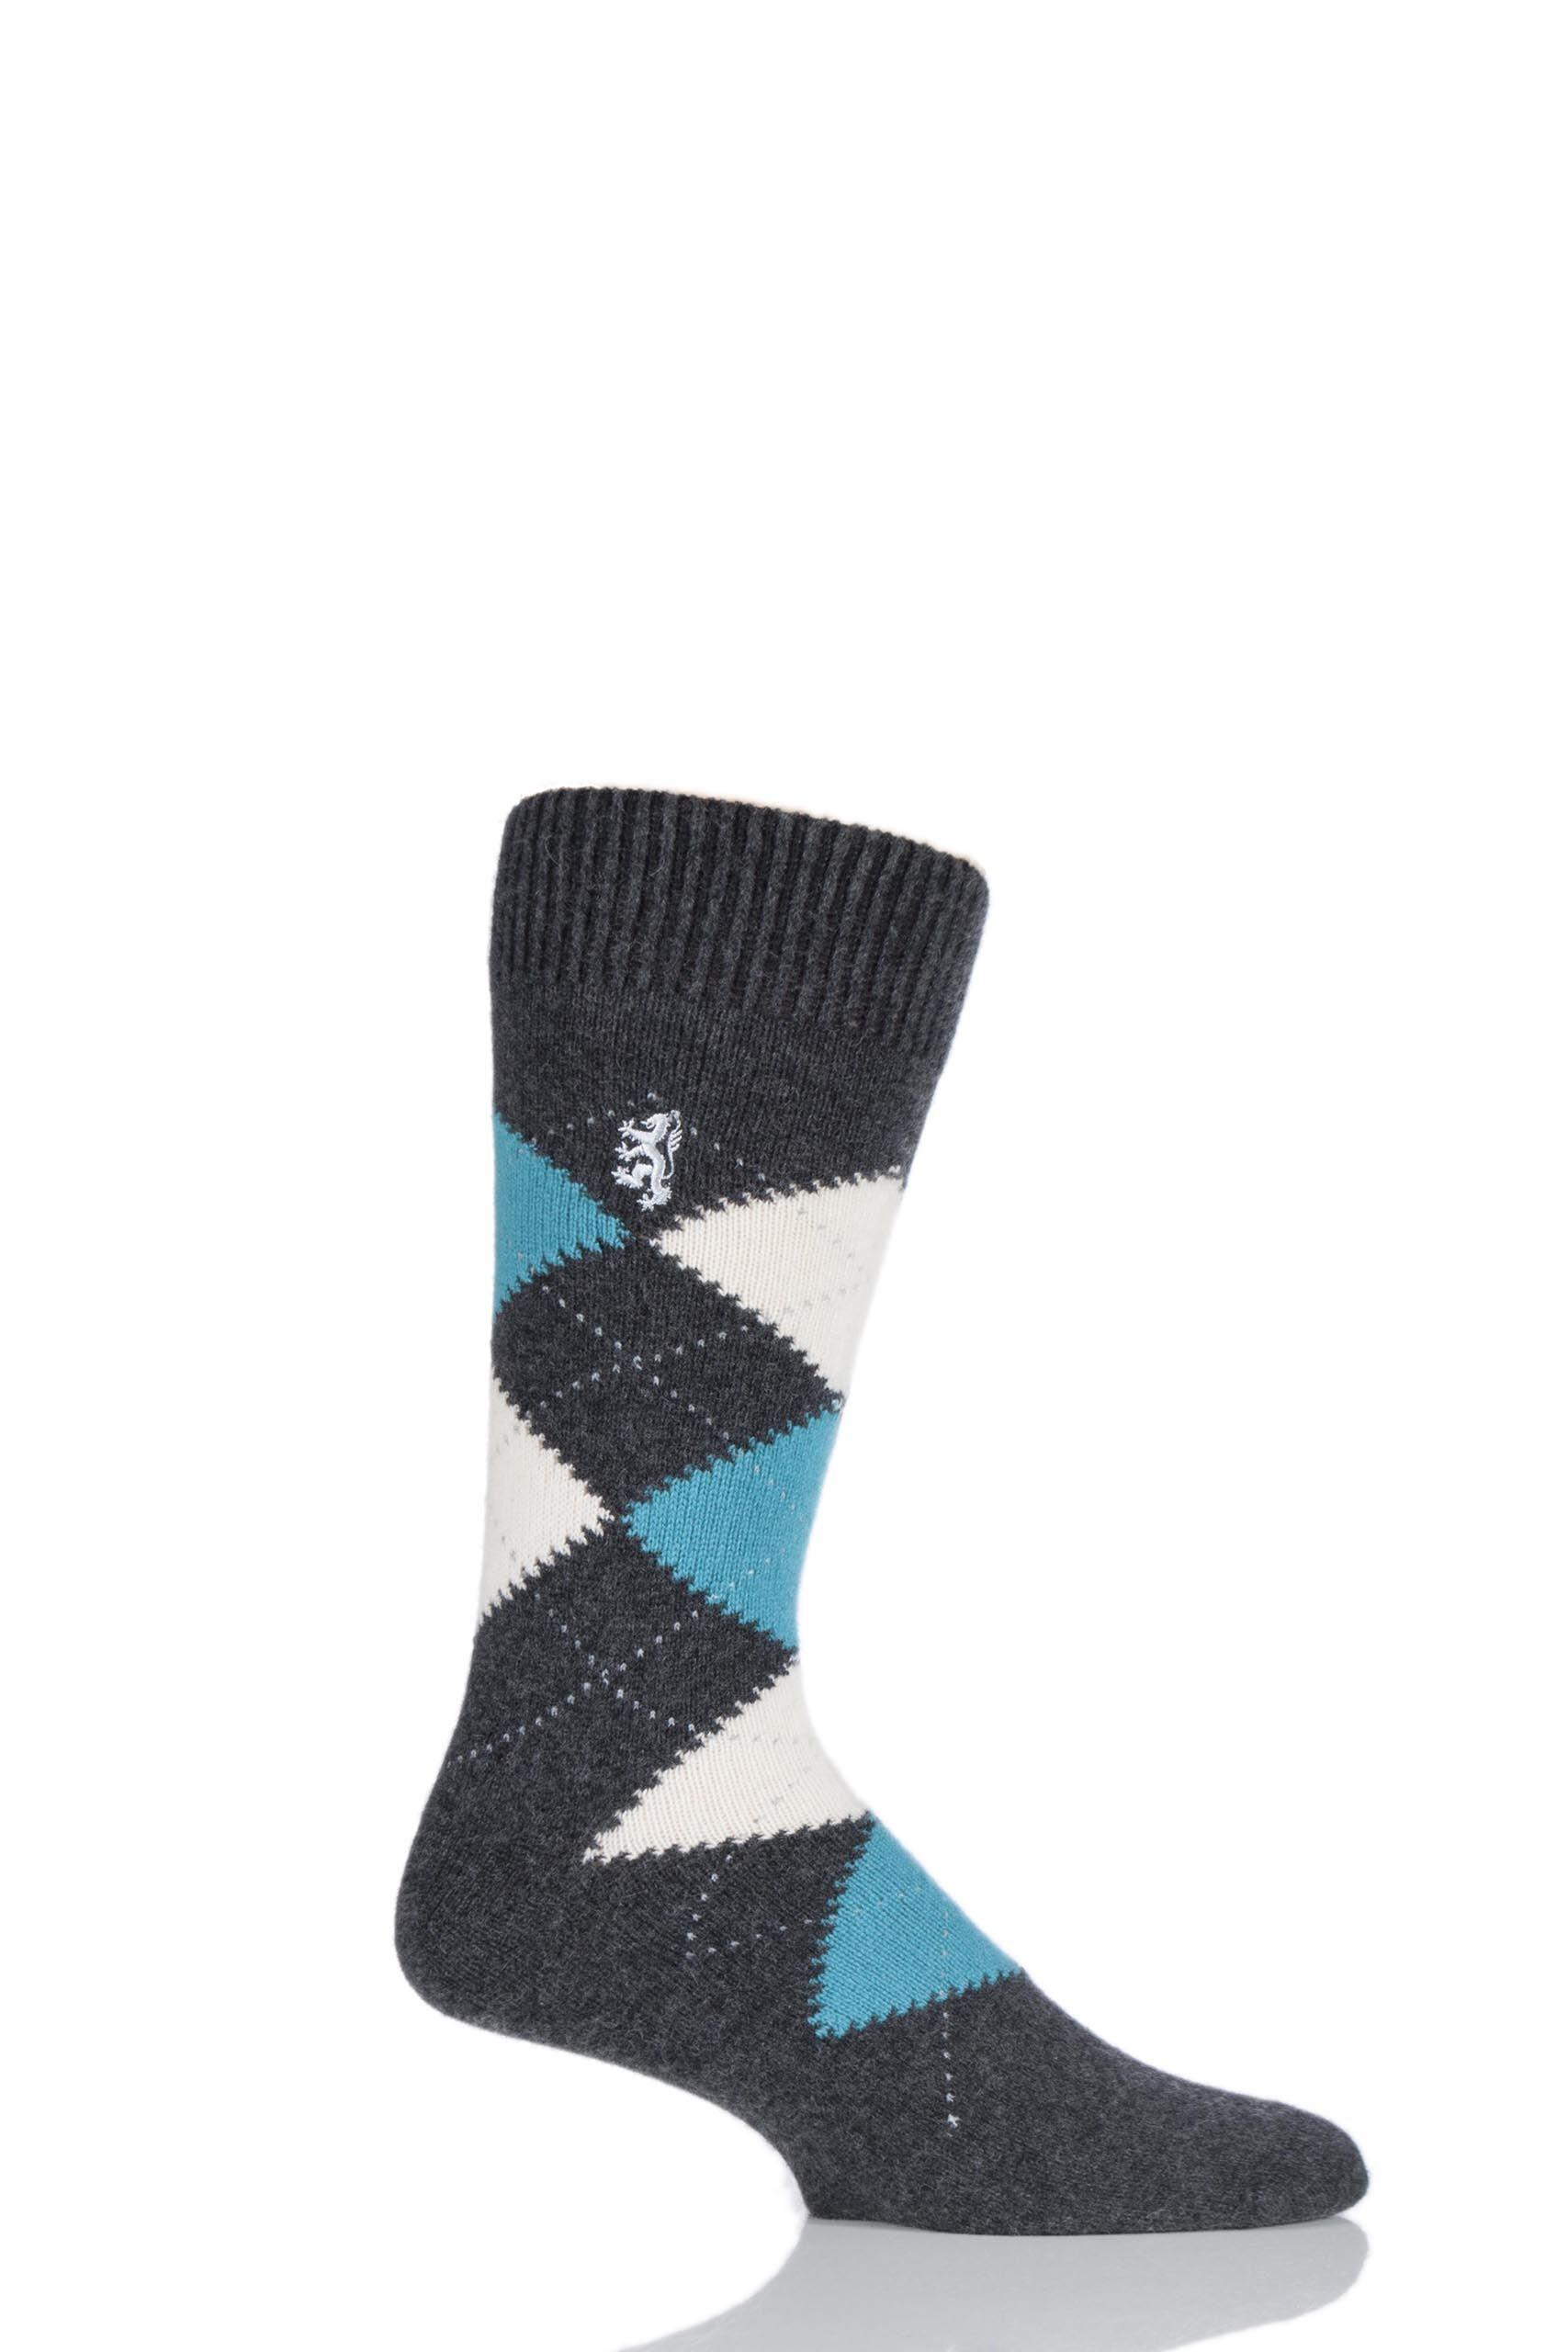 Image of 1 Pair Charcoal 85% Cashmere Argyle Socks Men's 6-8.5 Mens - Pringle of Scotland